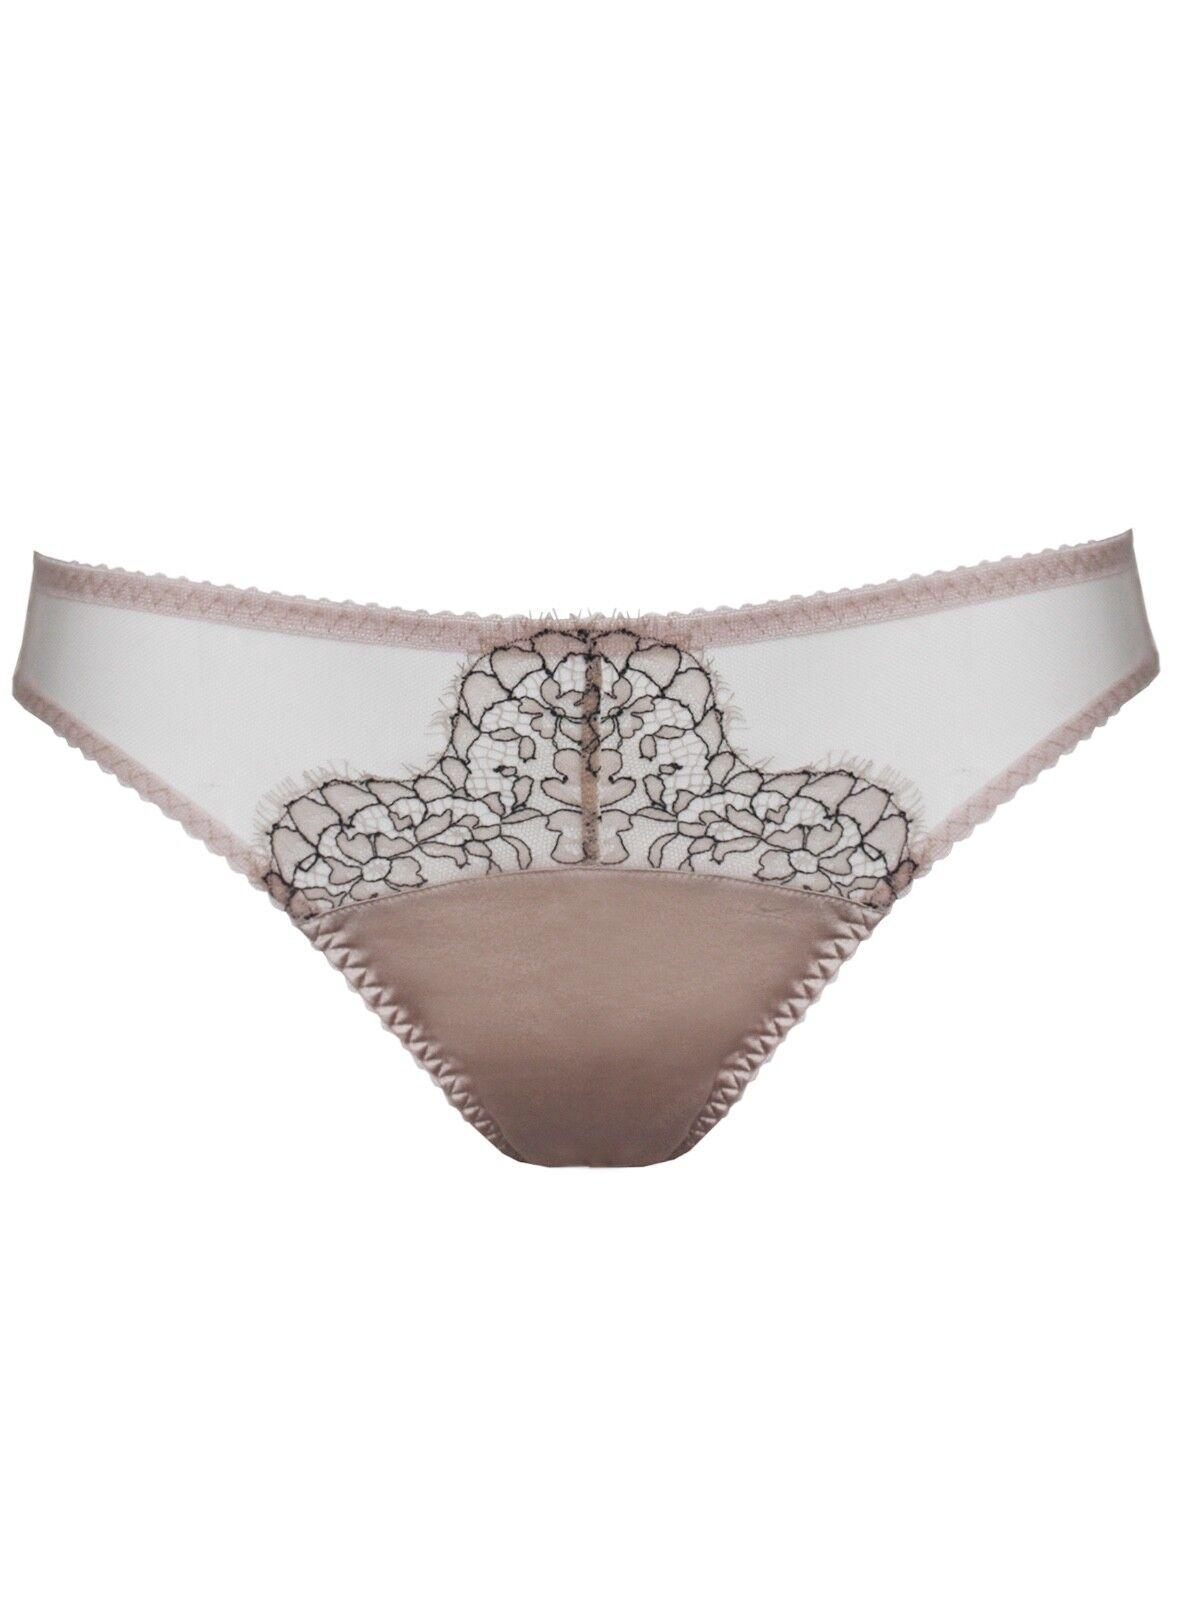 Fleur of England Seduction Medium Silk Brief NWT RRP